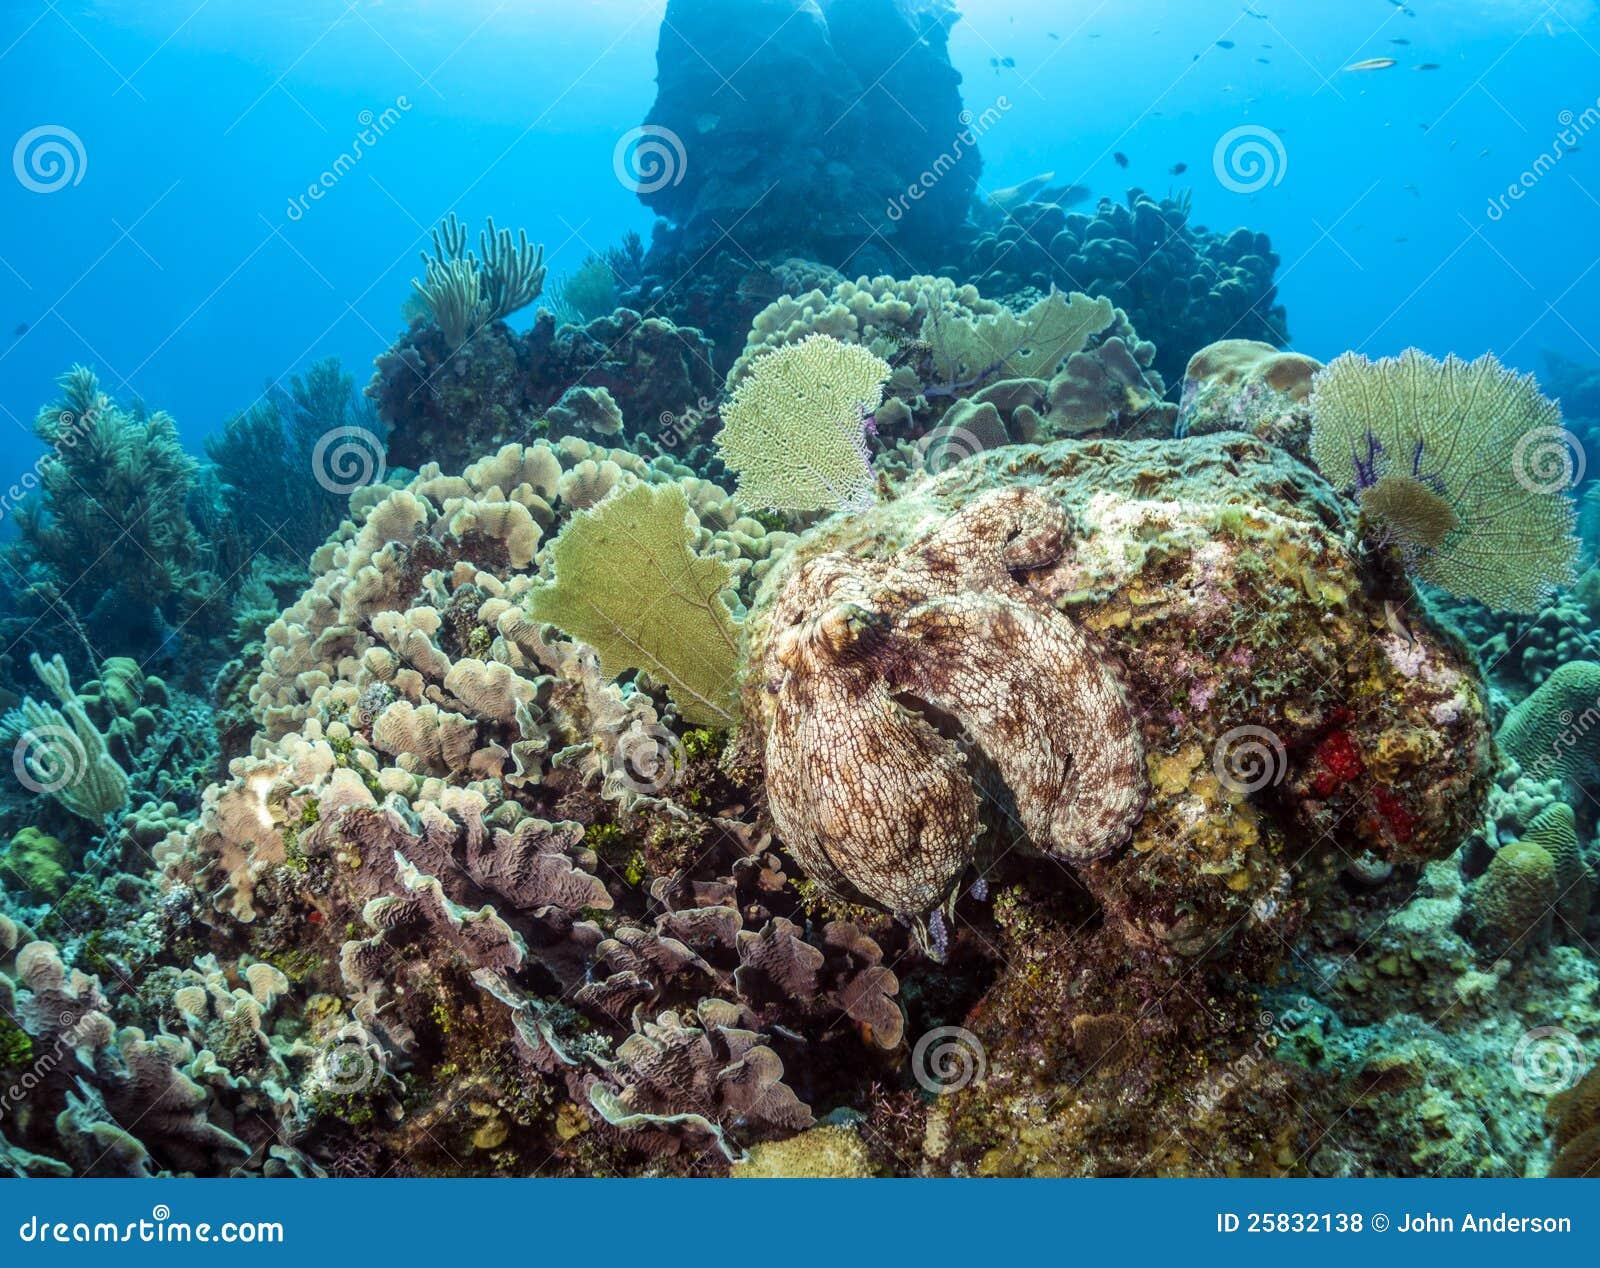 Caribbean Reef Octopus (Octopus Briareus) Royalty Free Stock Photos ...